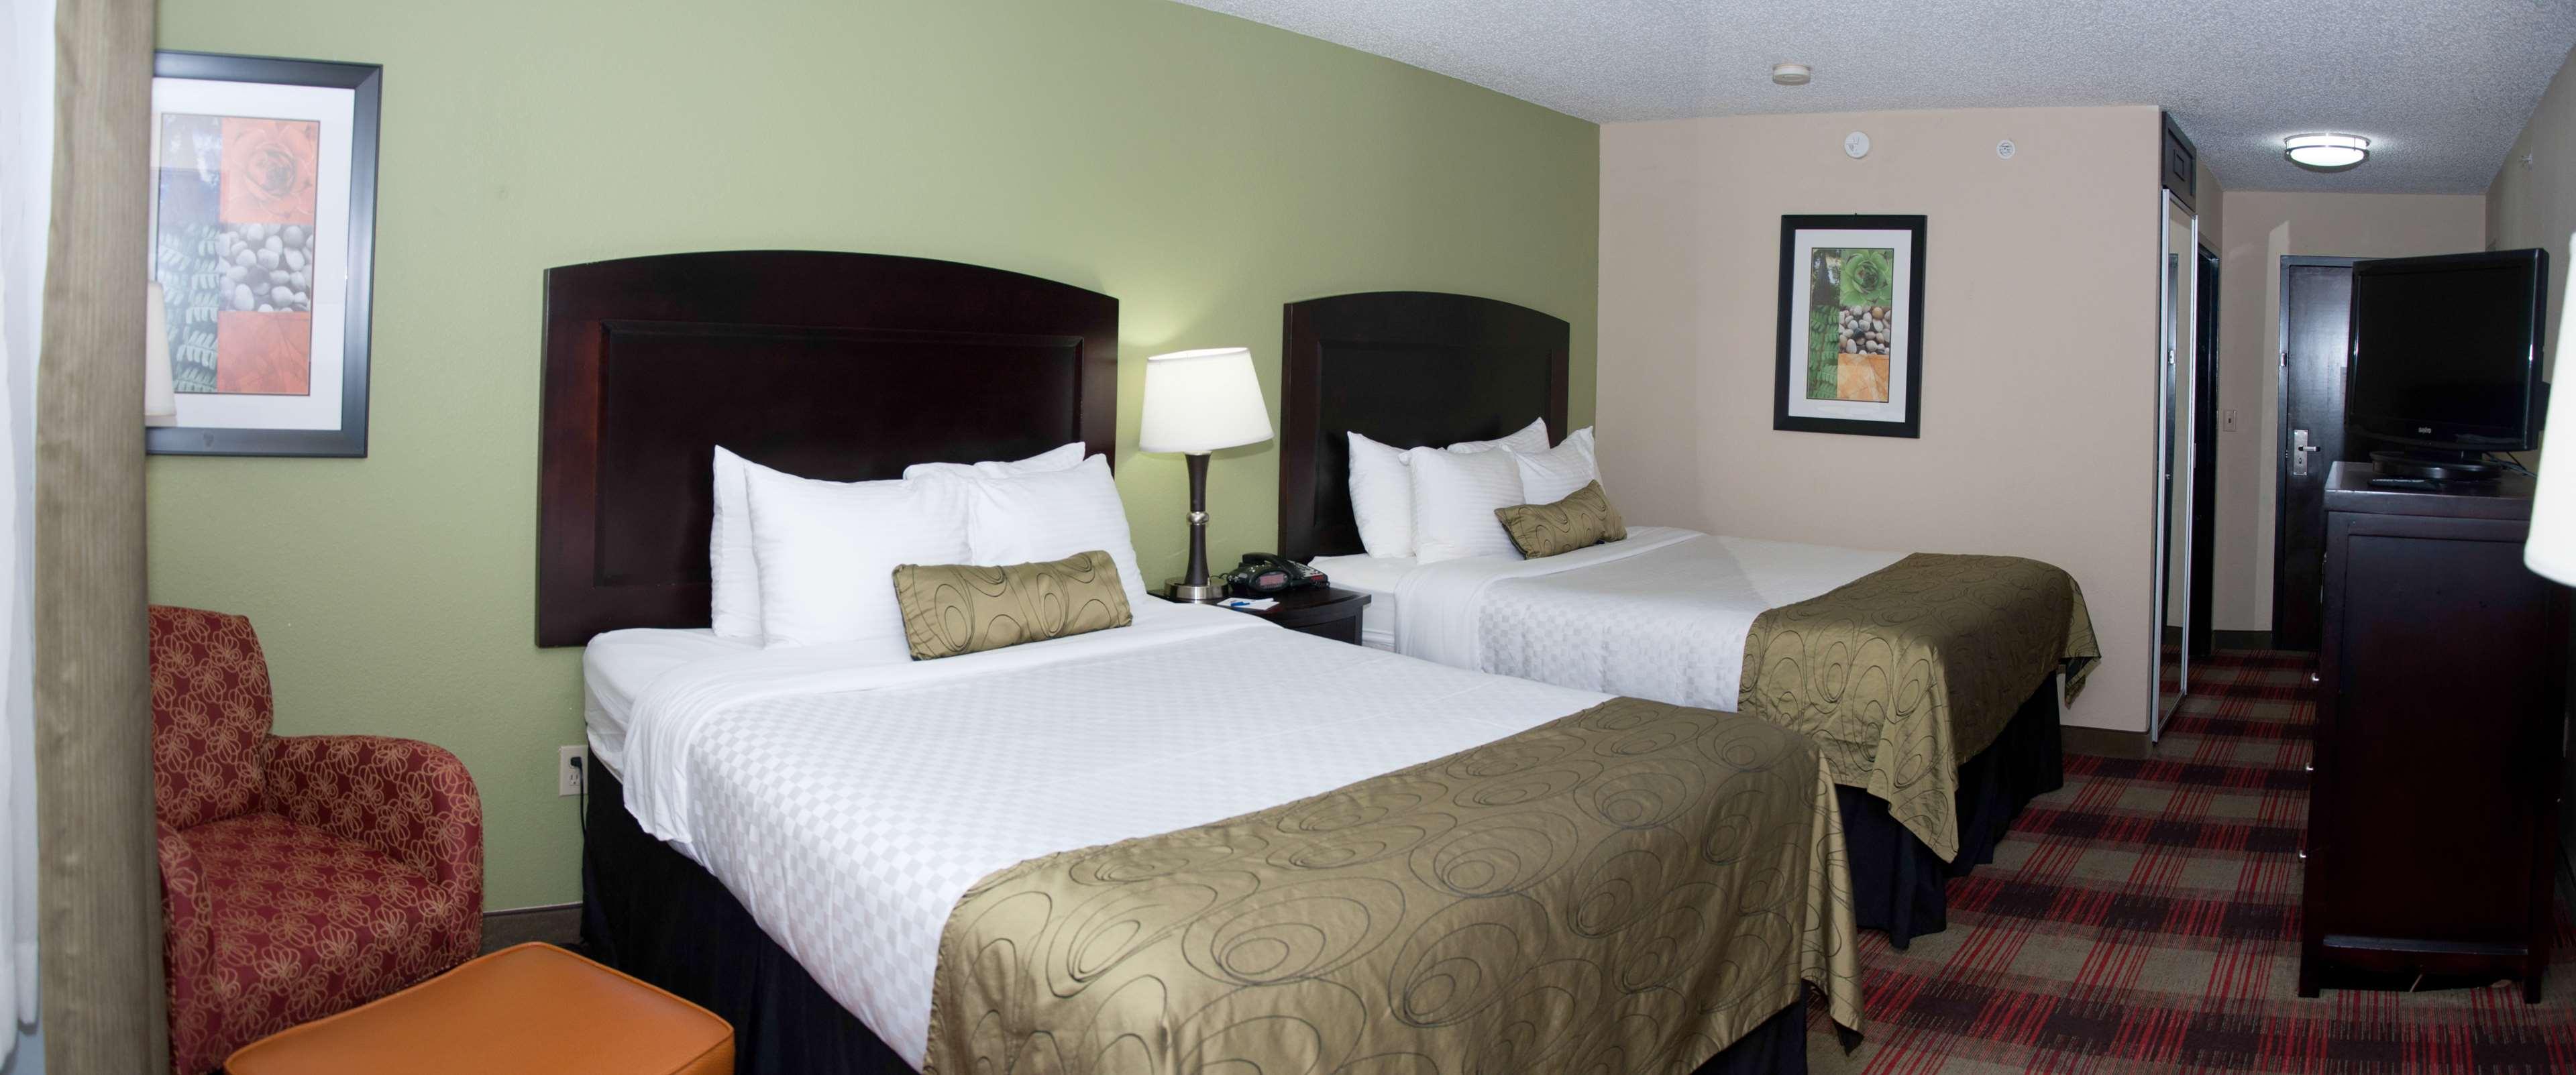 Best Western Plus Addison/Dallas Hotel image 19